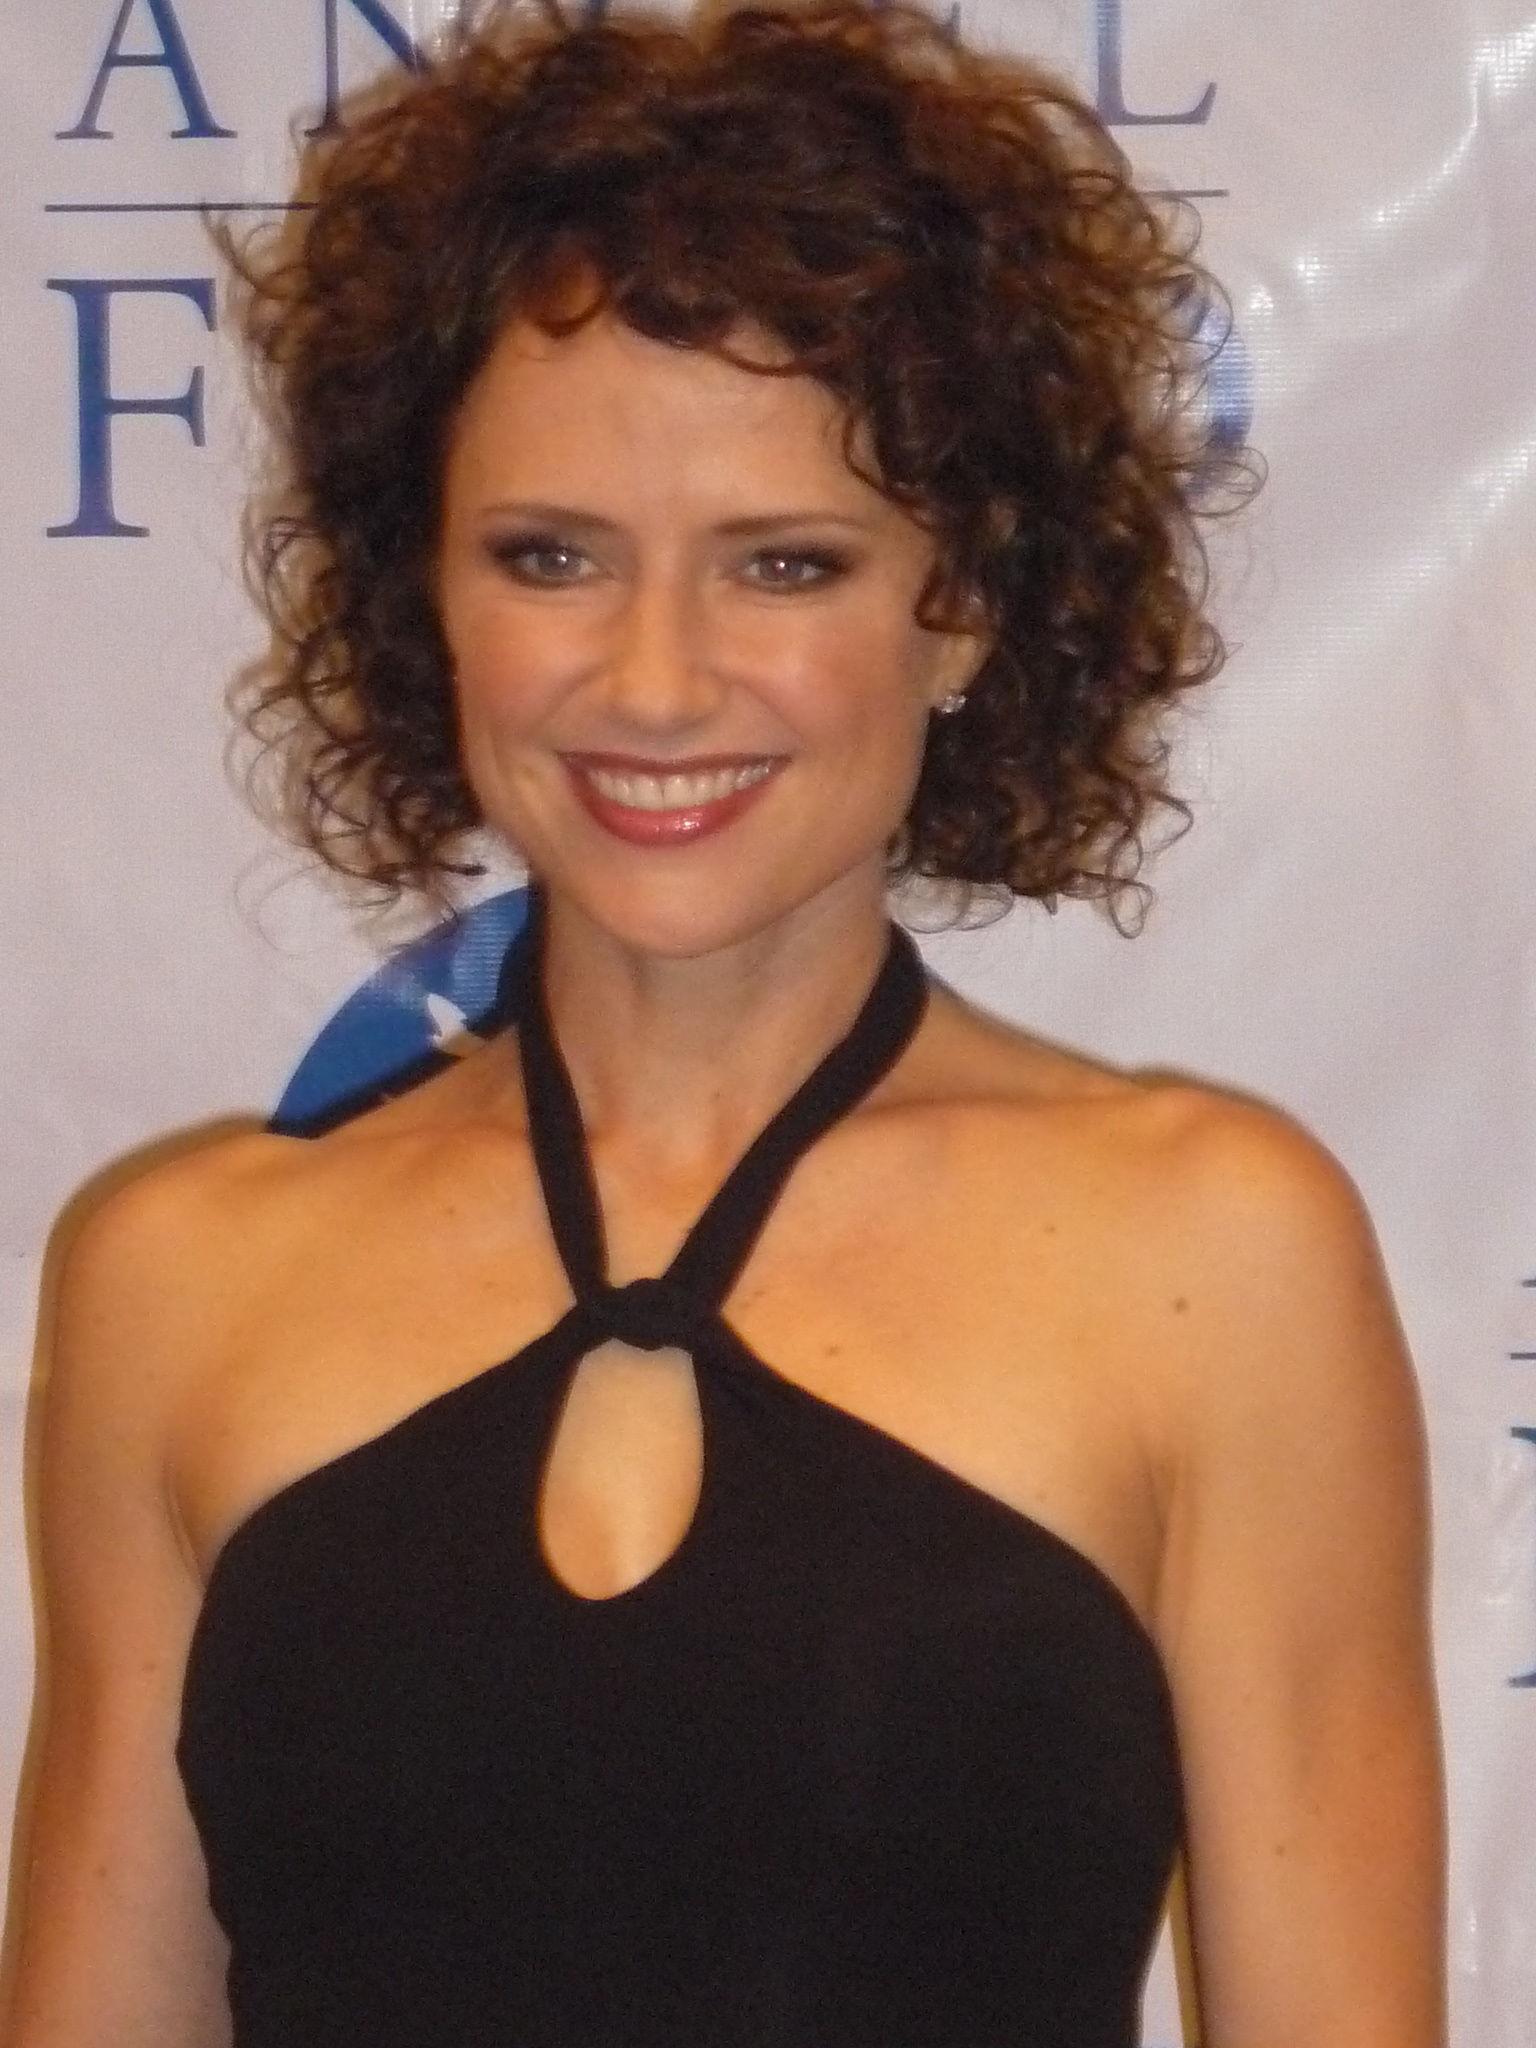 Photo of Jean Louisa Kelly: American actress